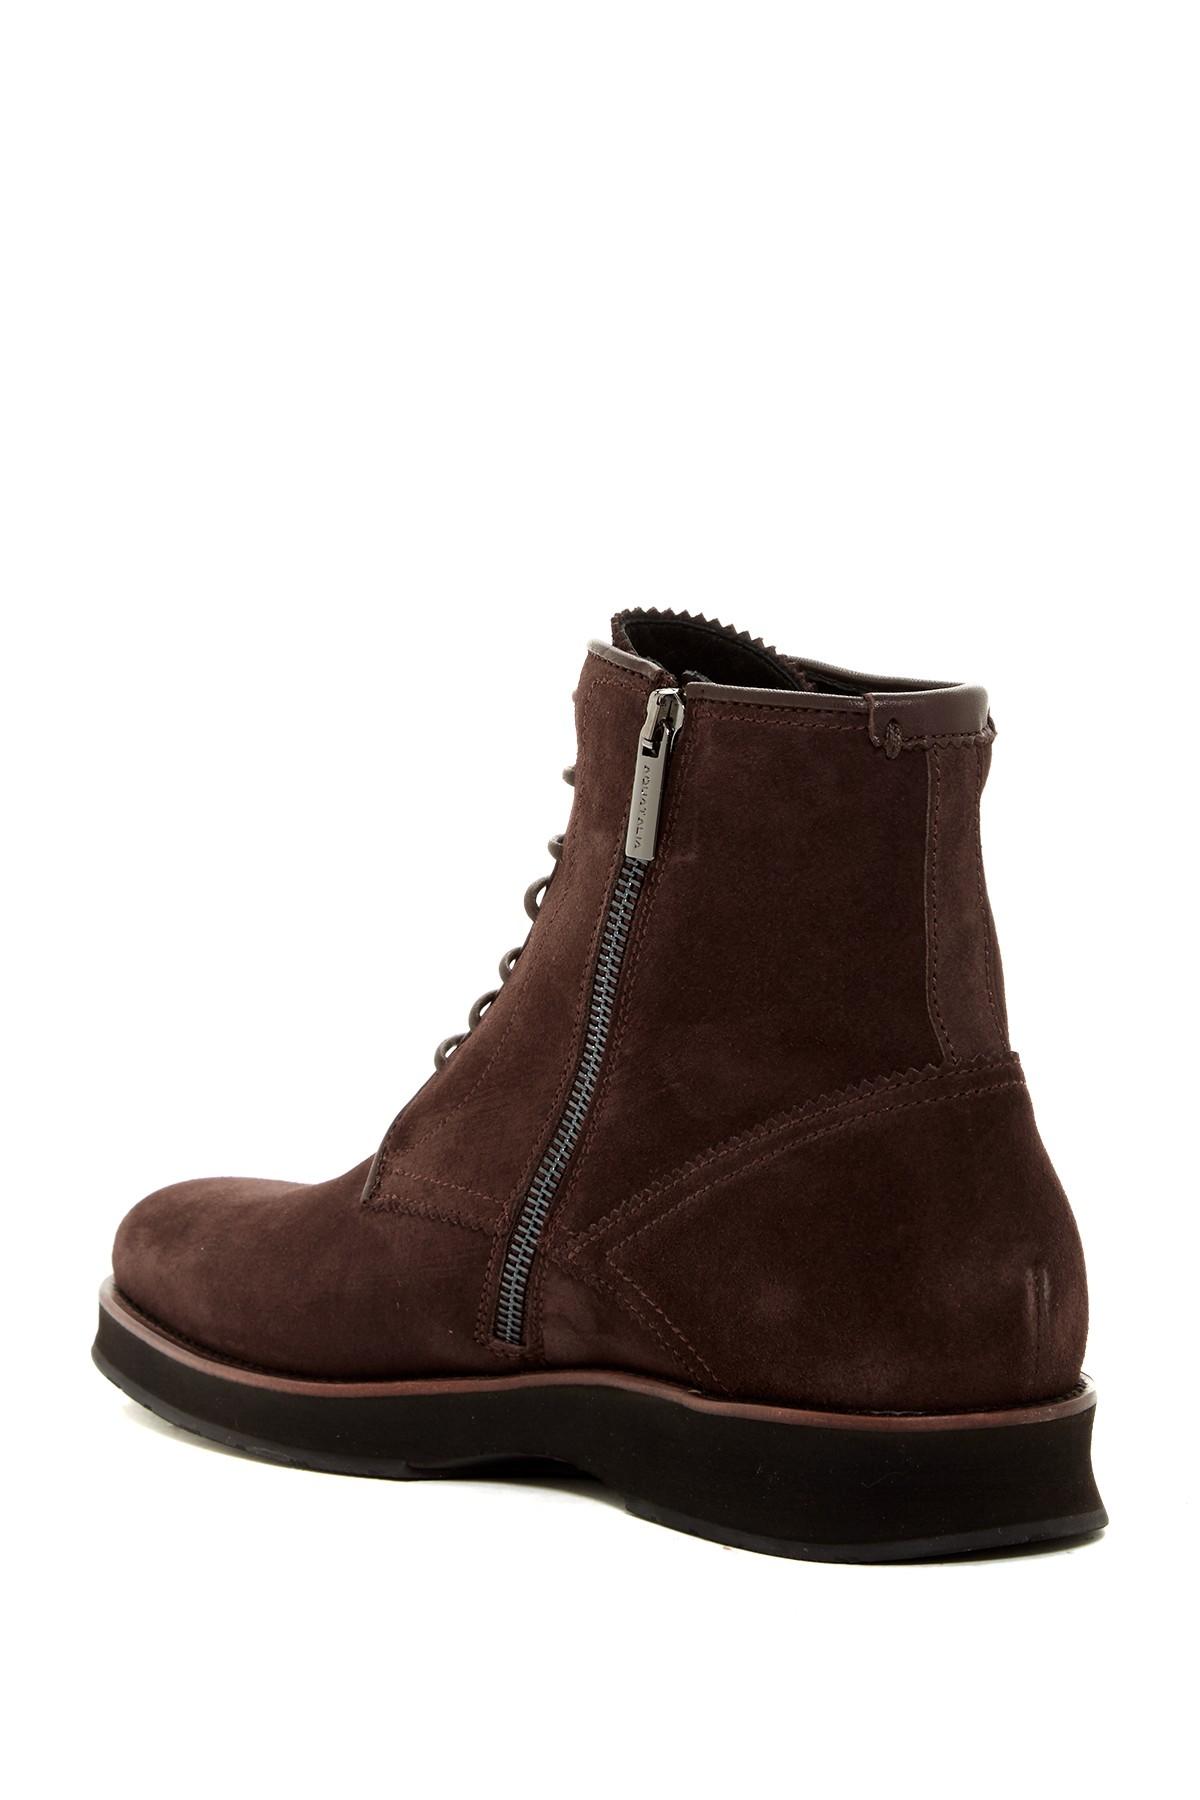 Aquatalia Gale Mid Rise Weatherproof Boot in Brown for Men ...